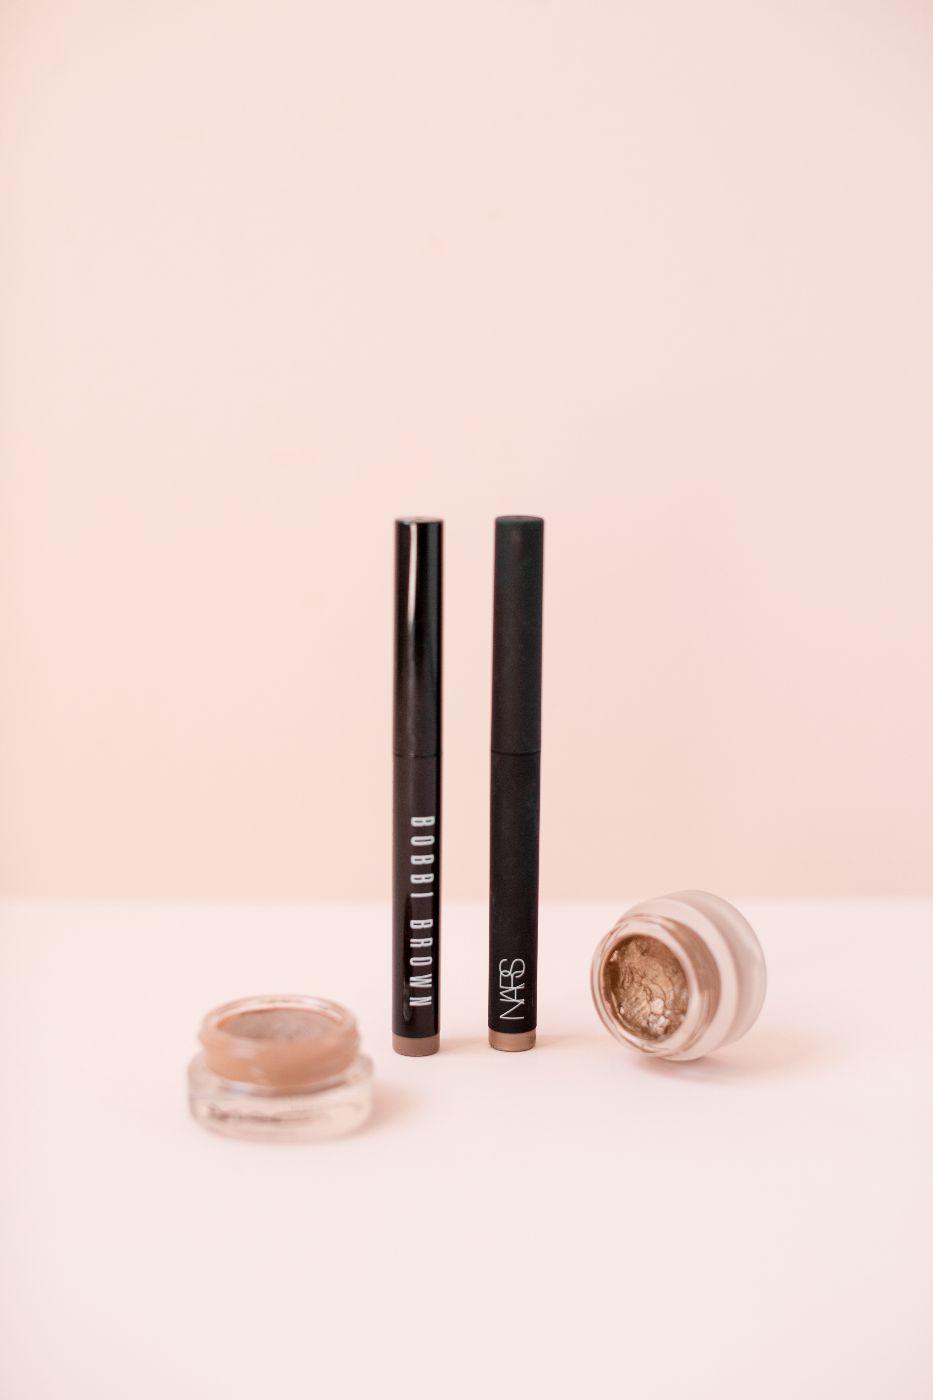 theannaedit-summer-creamy-makeup-beauty-picks-tanya-burr-bobbi-brown-itcosmetics-swatches-july-2017-3